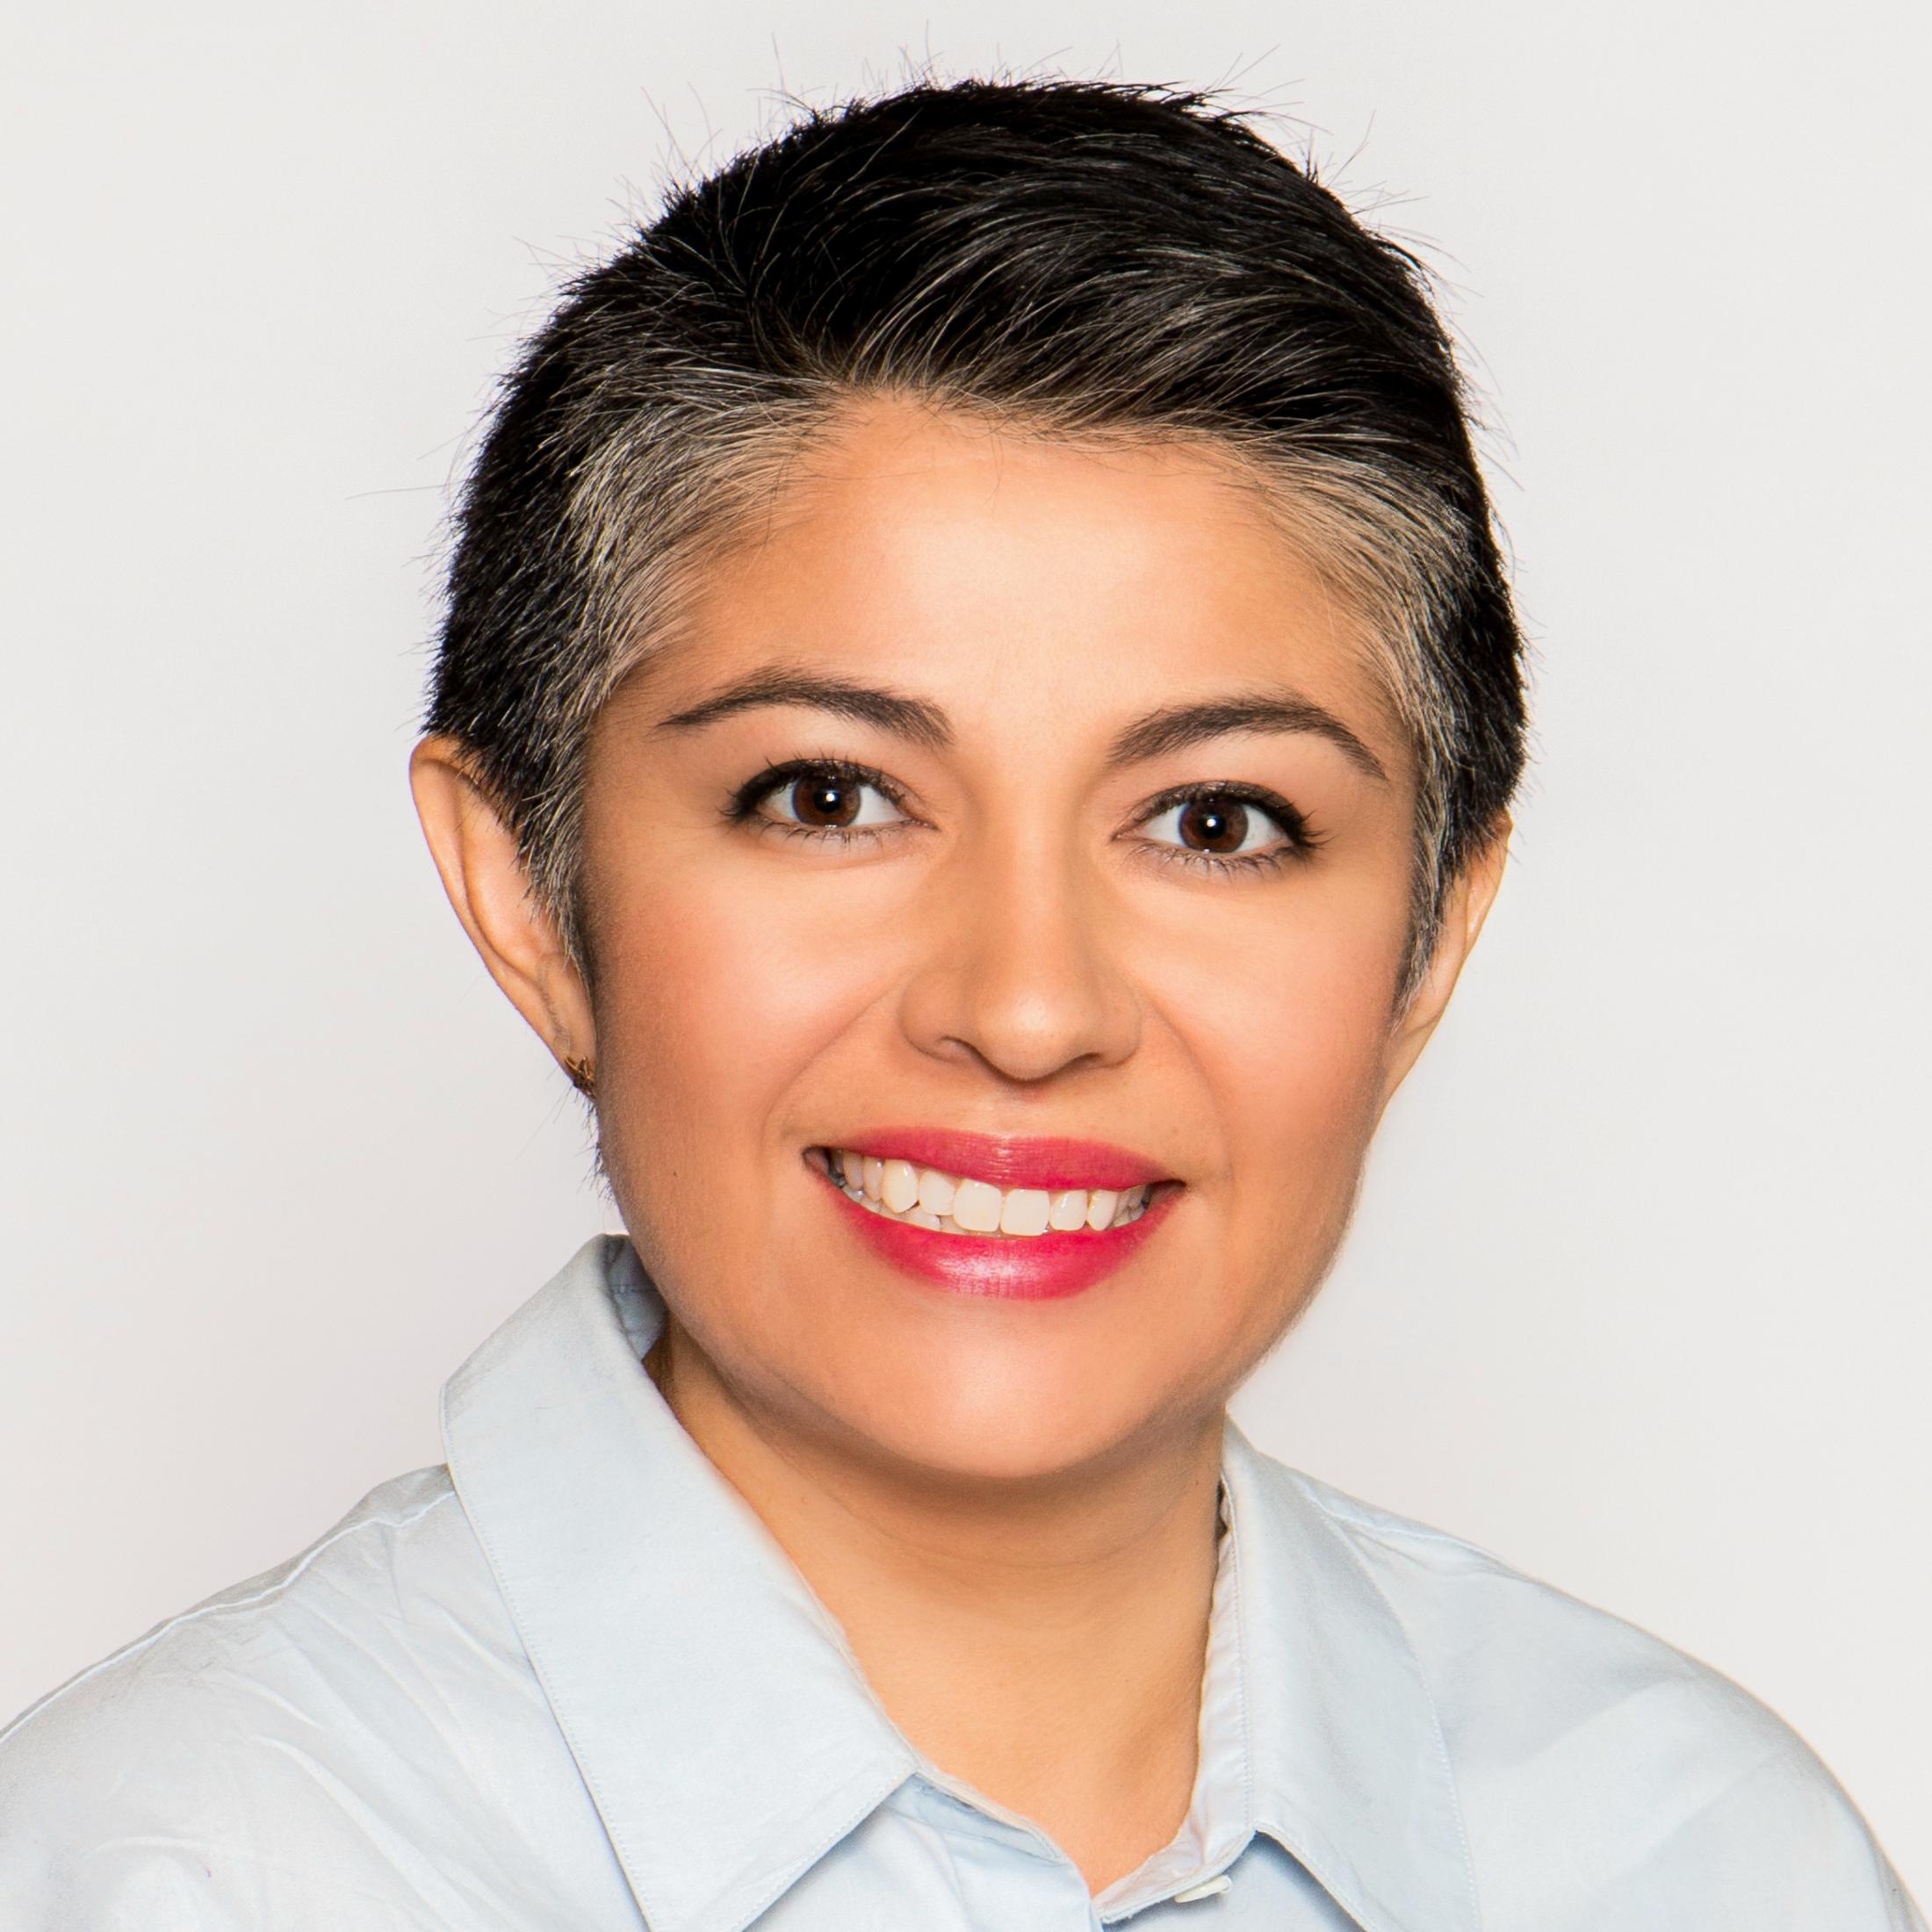 Andrea Sáenz